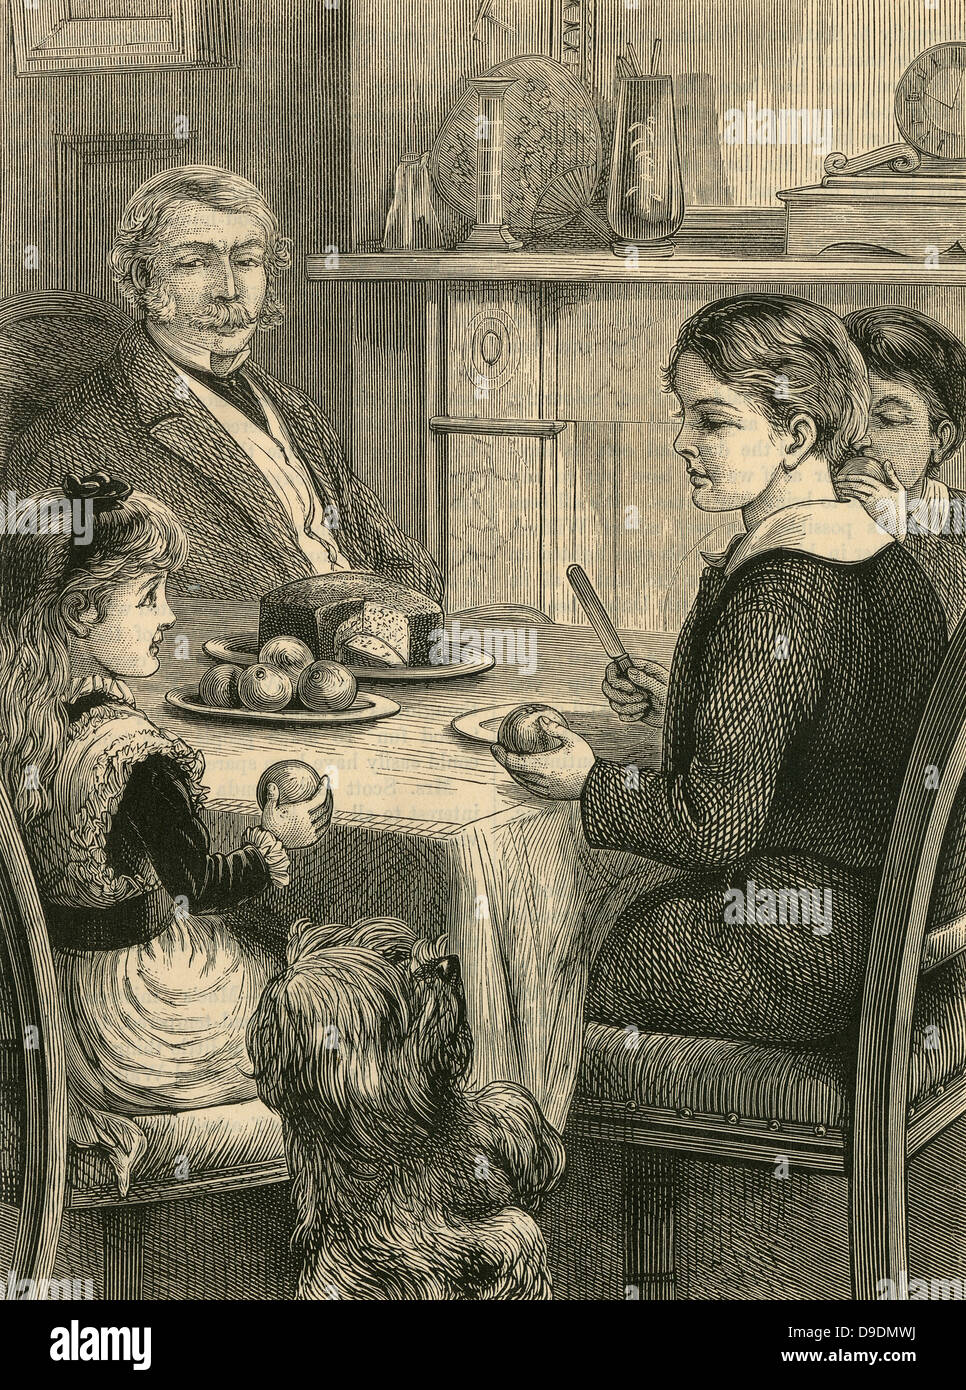 Familia Tea Time: perro mascota pidiendo una golosina. Grabado, 1882 Imagen De Stock